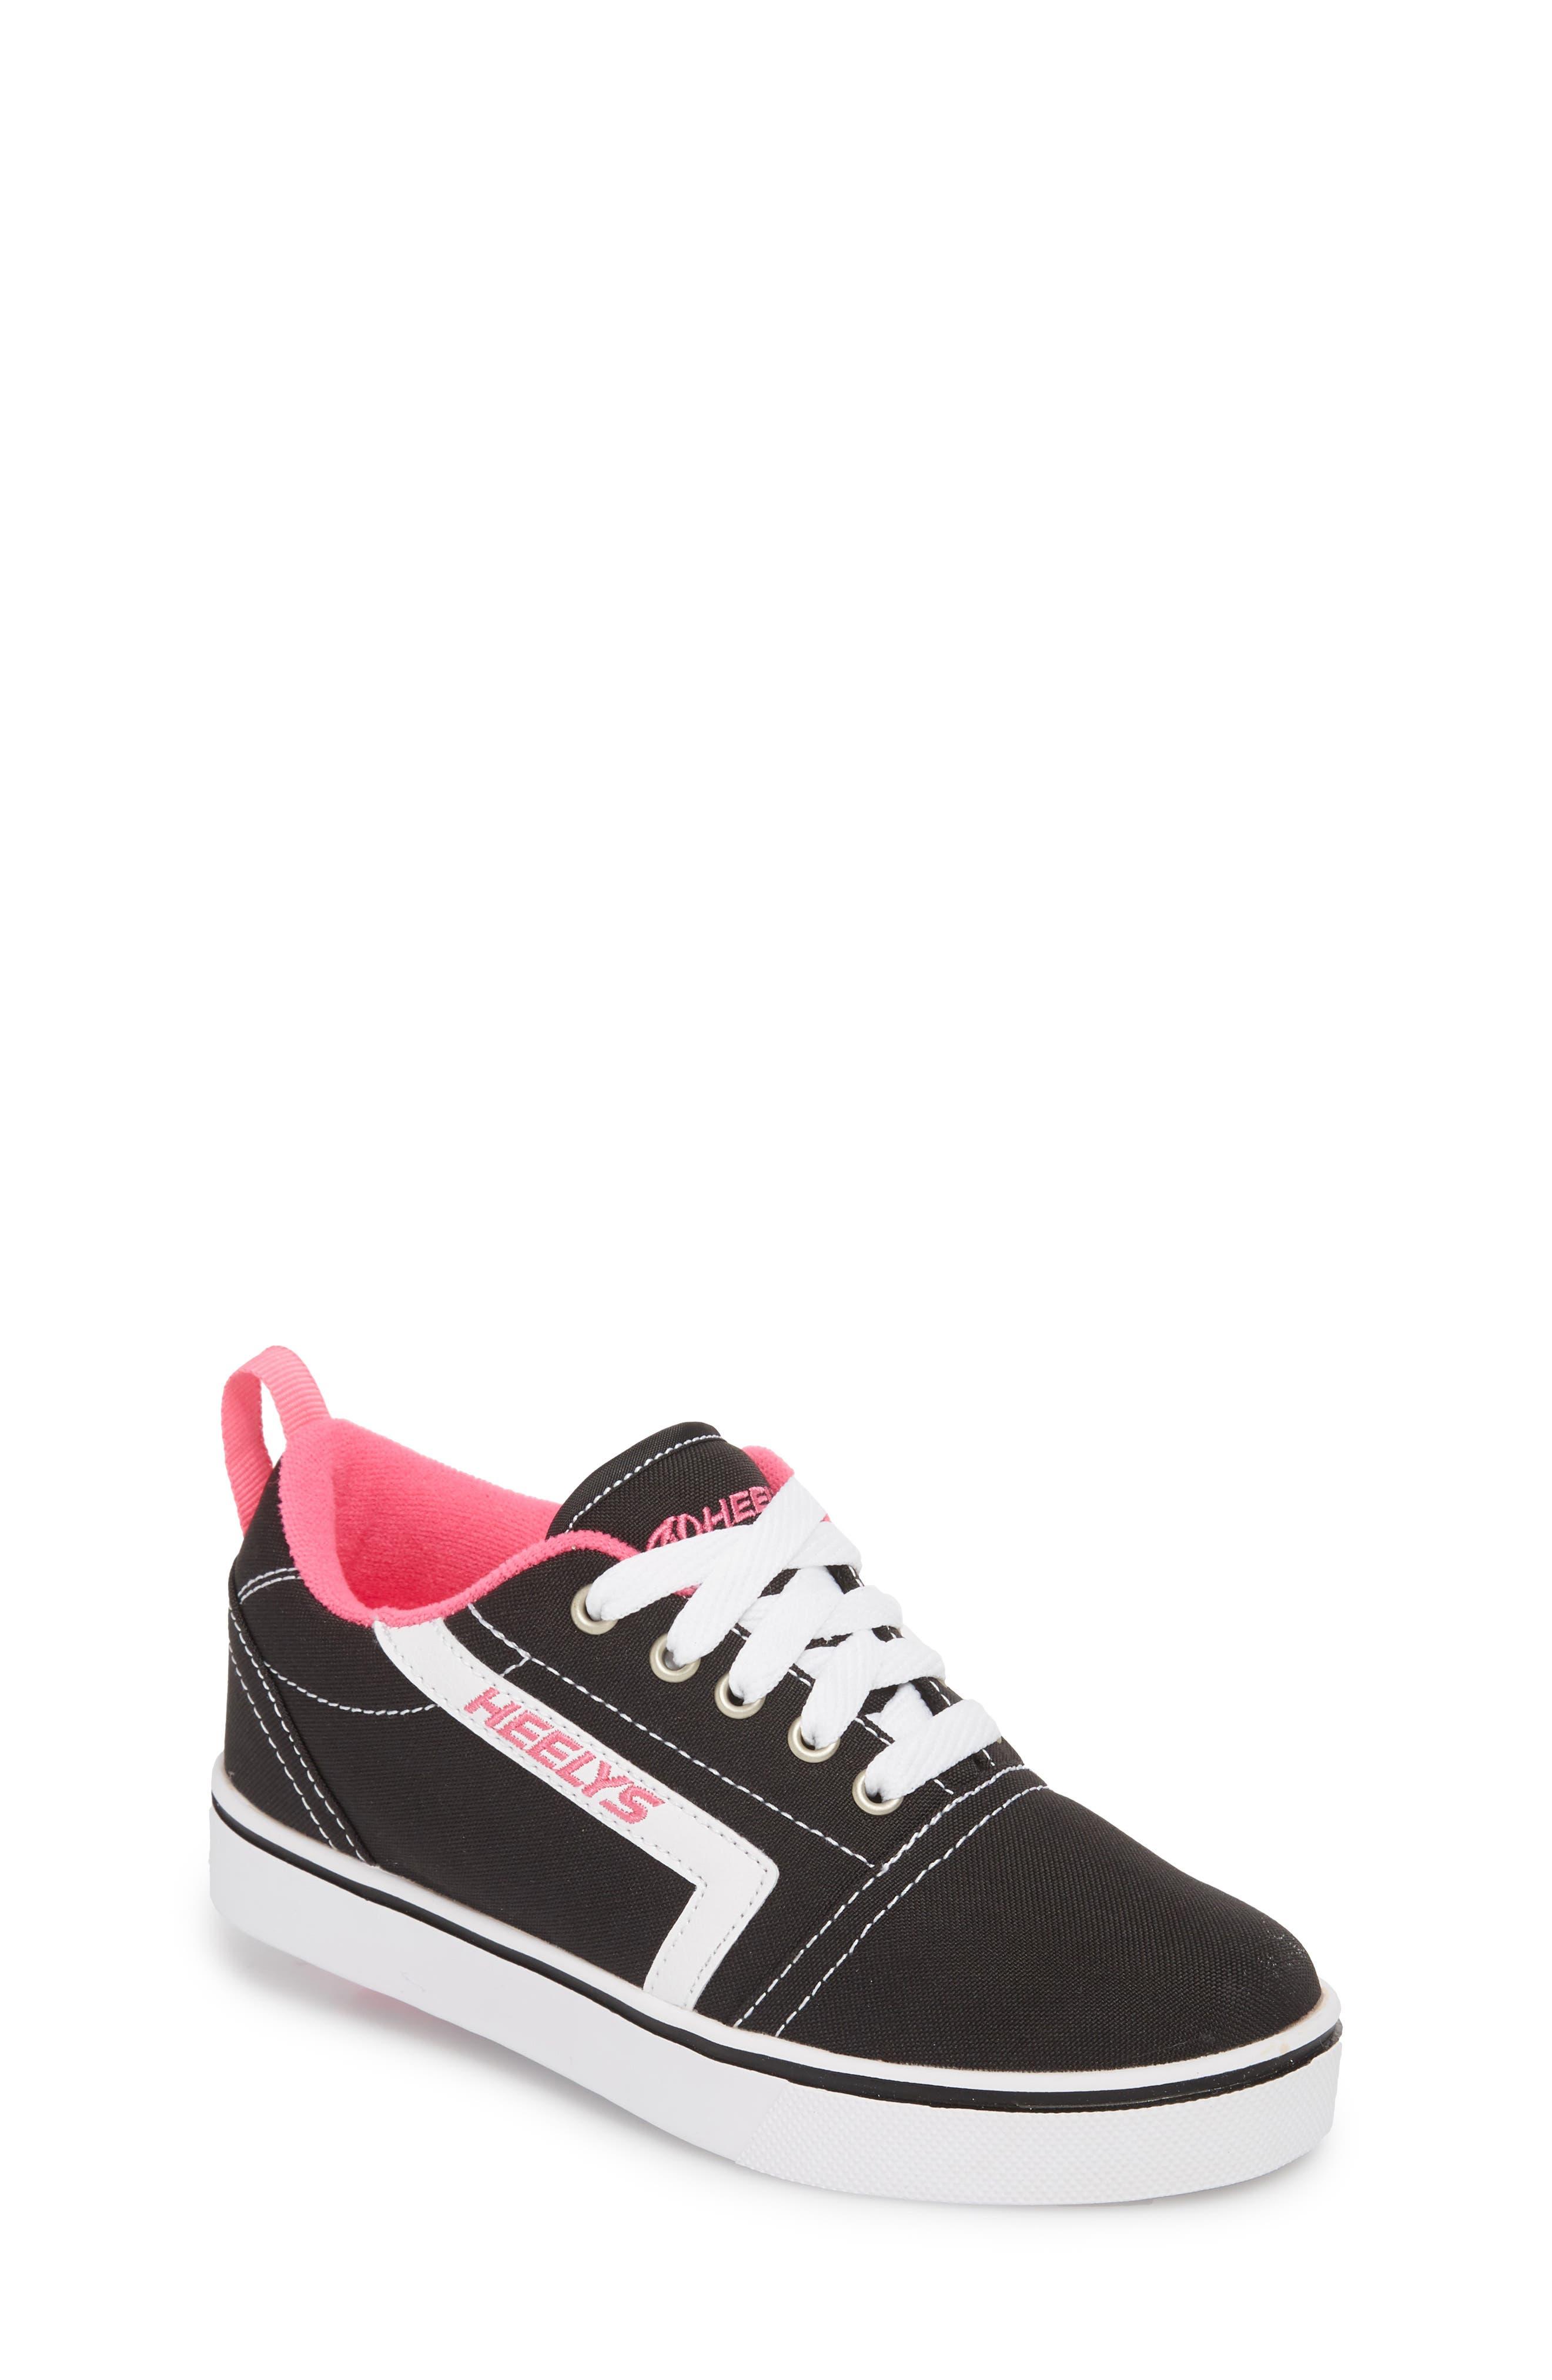 GR8 Pro Wheeled Sneaker,                         Main,                         color, Black/ White/ Hot Pink